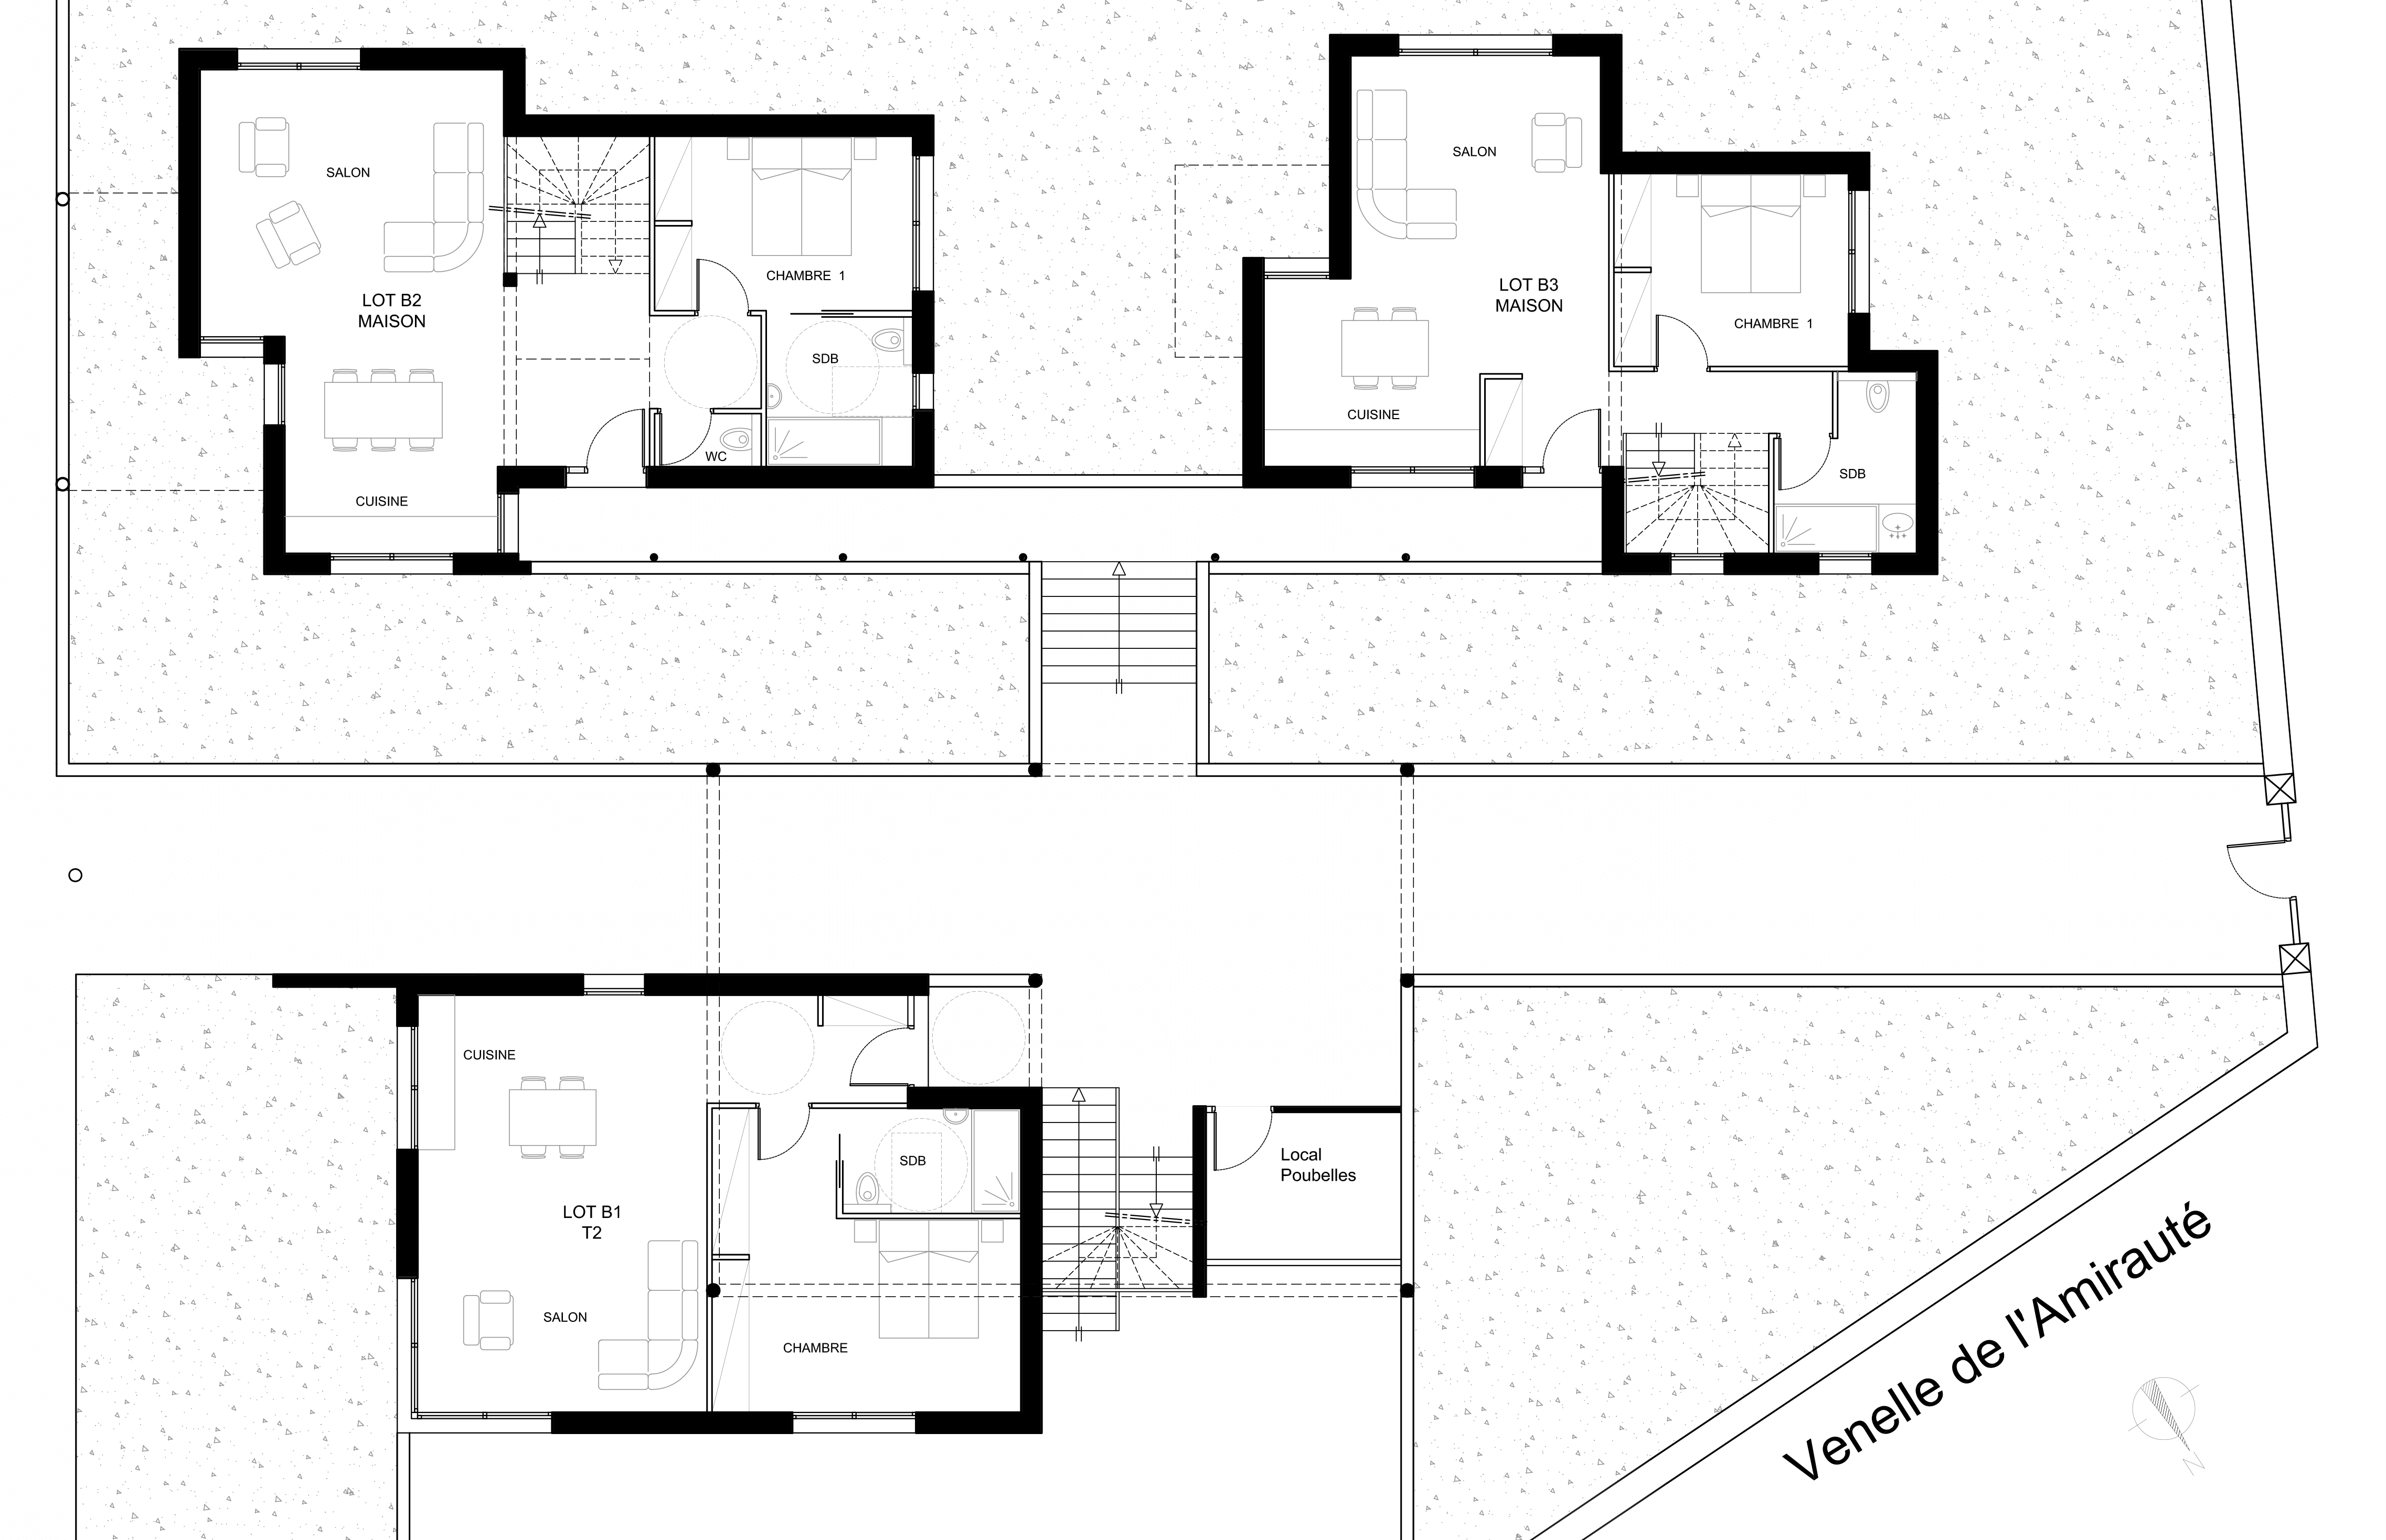 Projet BON plan RDC lot B (1)